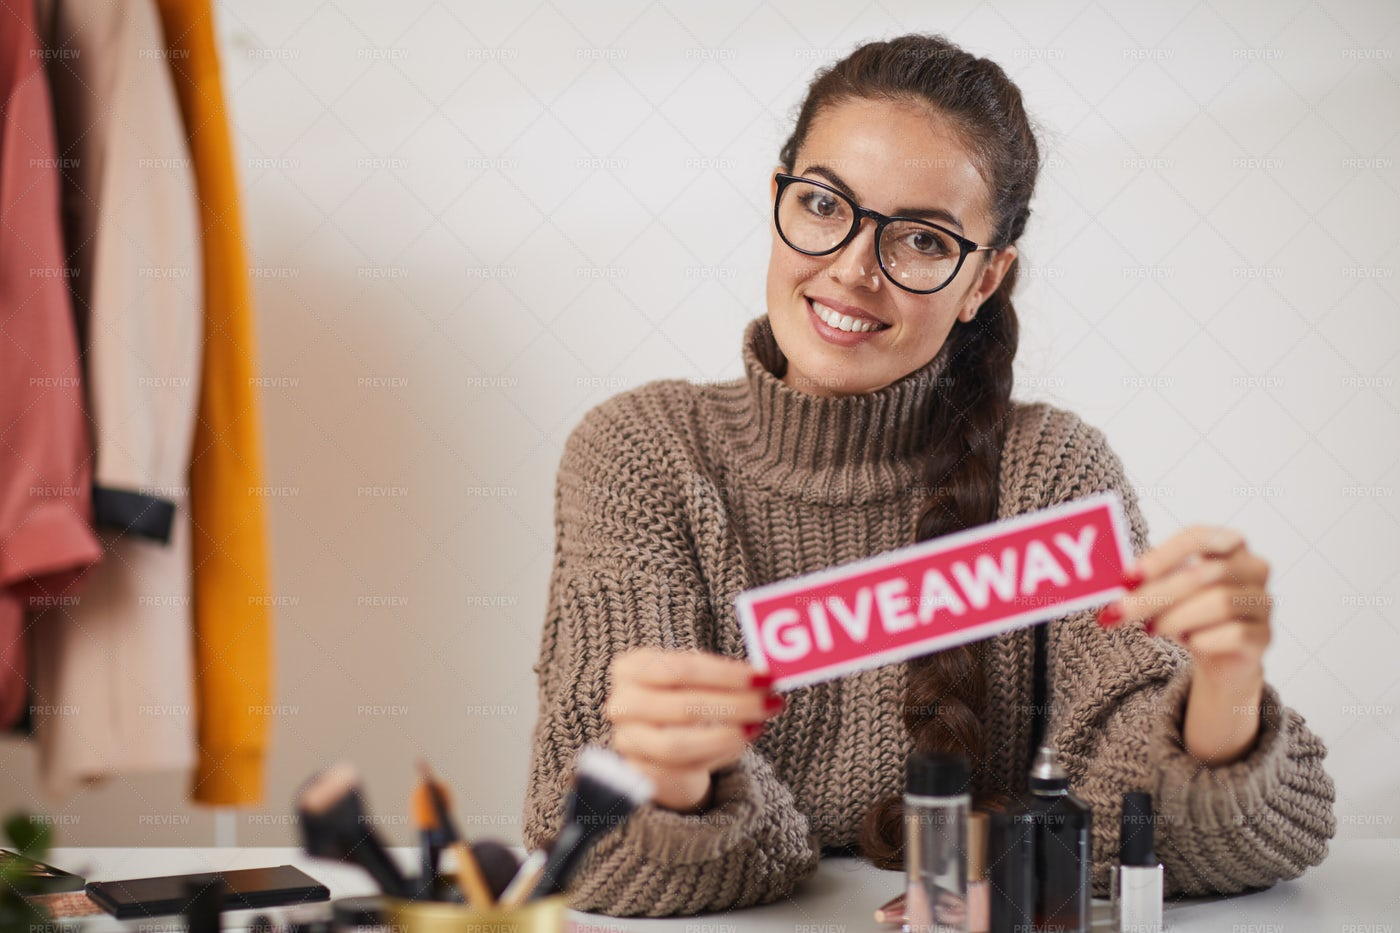 Beauty Guru Hosting Giveaway: Stock Photos